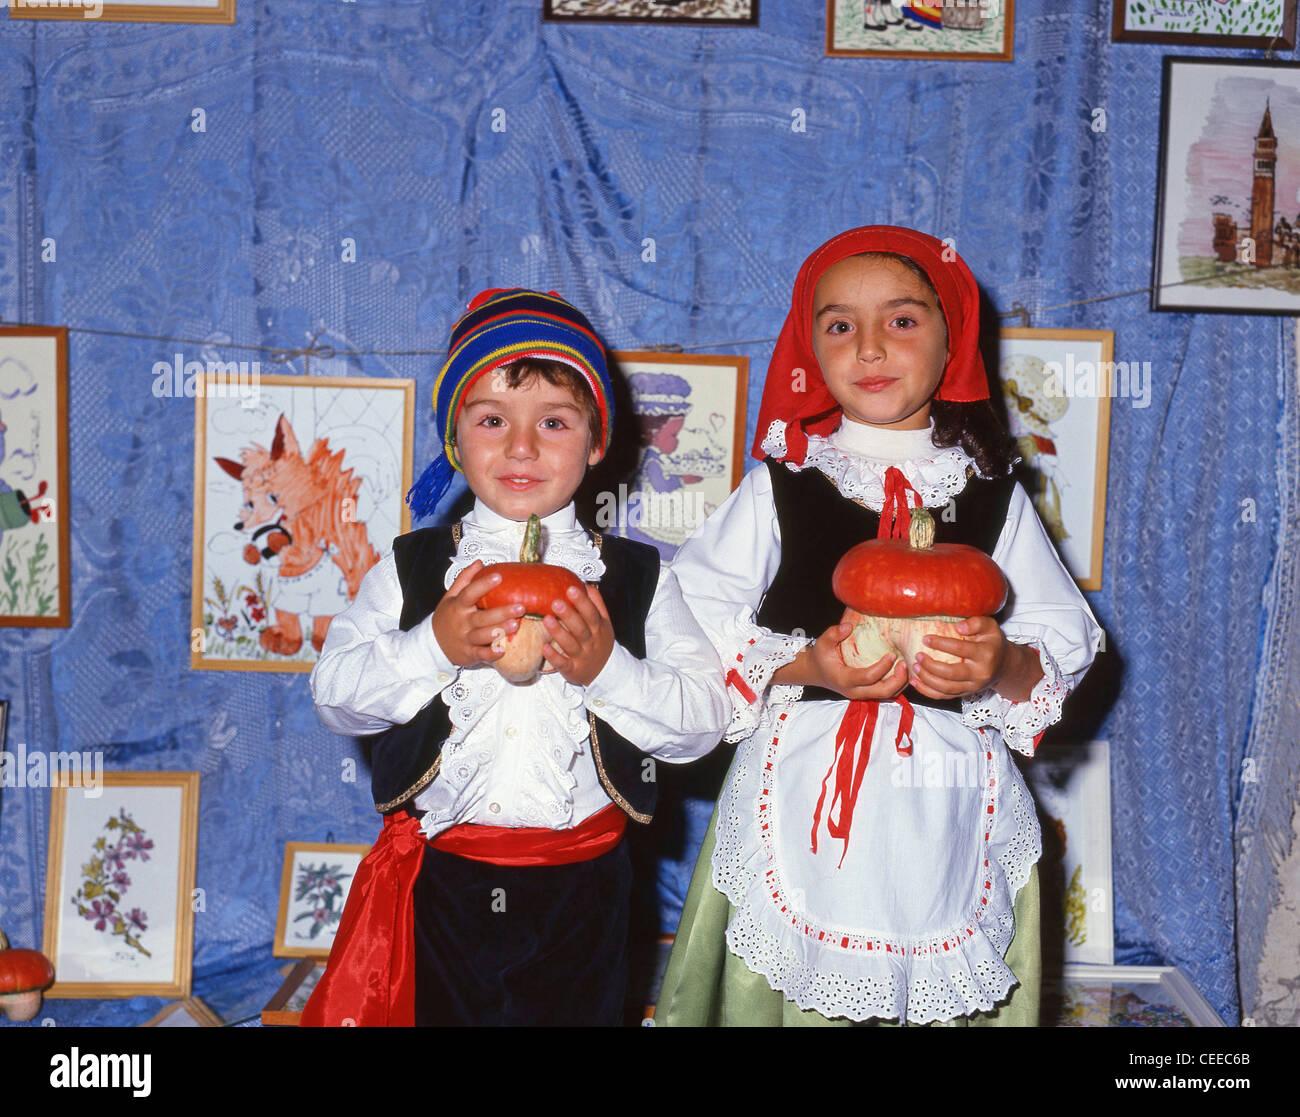 Kinder in Tracht, Sorrento, Provinz Neapel, Campania Region, Italien Stockbild